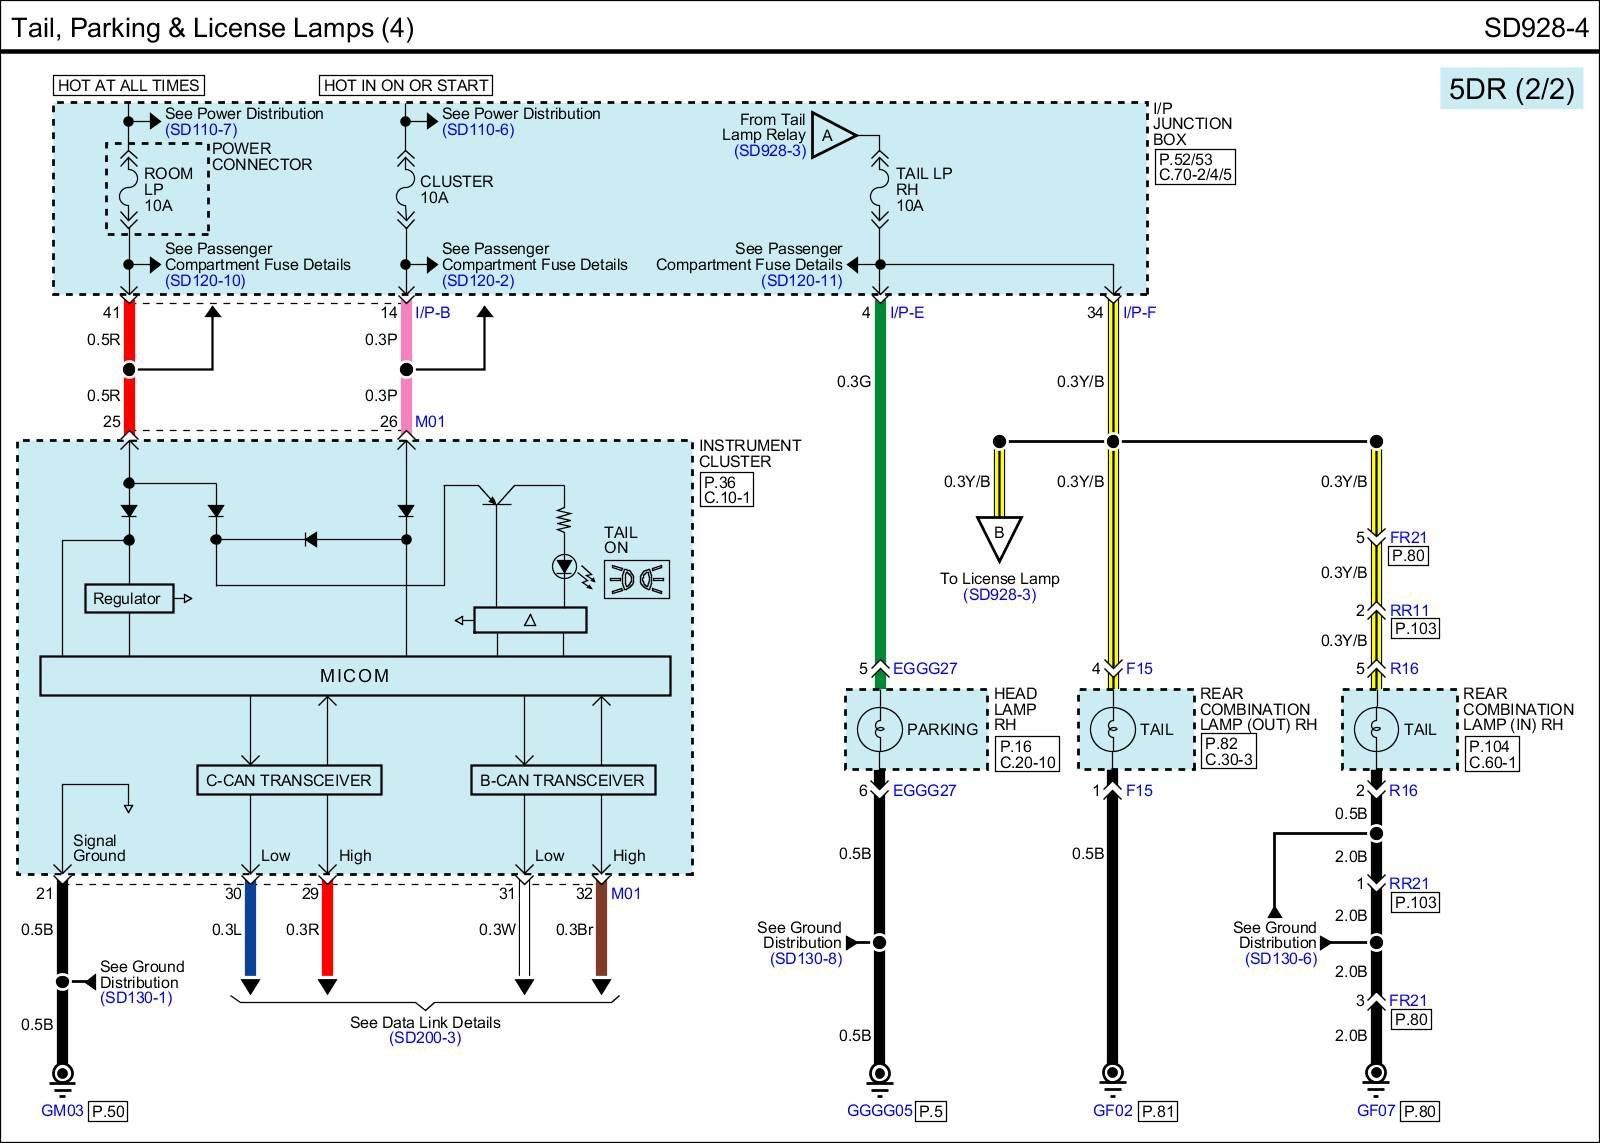 2002 Kia Optima ke Light Wiring Diagram | Wiring Diagram Kia Lights Wiring Diagram on kia ecu diagram, kia radio wiring harness, 2012 kia optima radio diagram, 05 kia sportage radio wire diagram, kia optima stereo diagram, kia service, kia sportage electrical diagram, kia steering diagram, kia engine diagram, kia transmission diagram, kia air conditioning diagram, kia soul stereo system wiring, kia fuse diagram, kia belt diagram, kia parts diagram, kia fuel pump wiring, kia relay diagram,